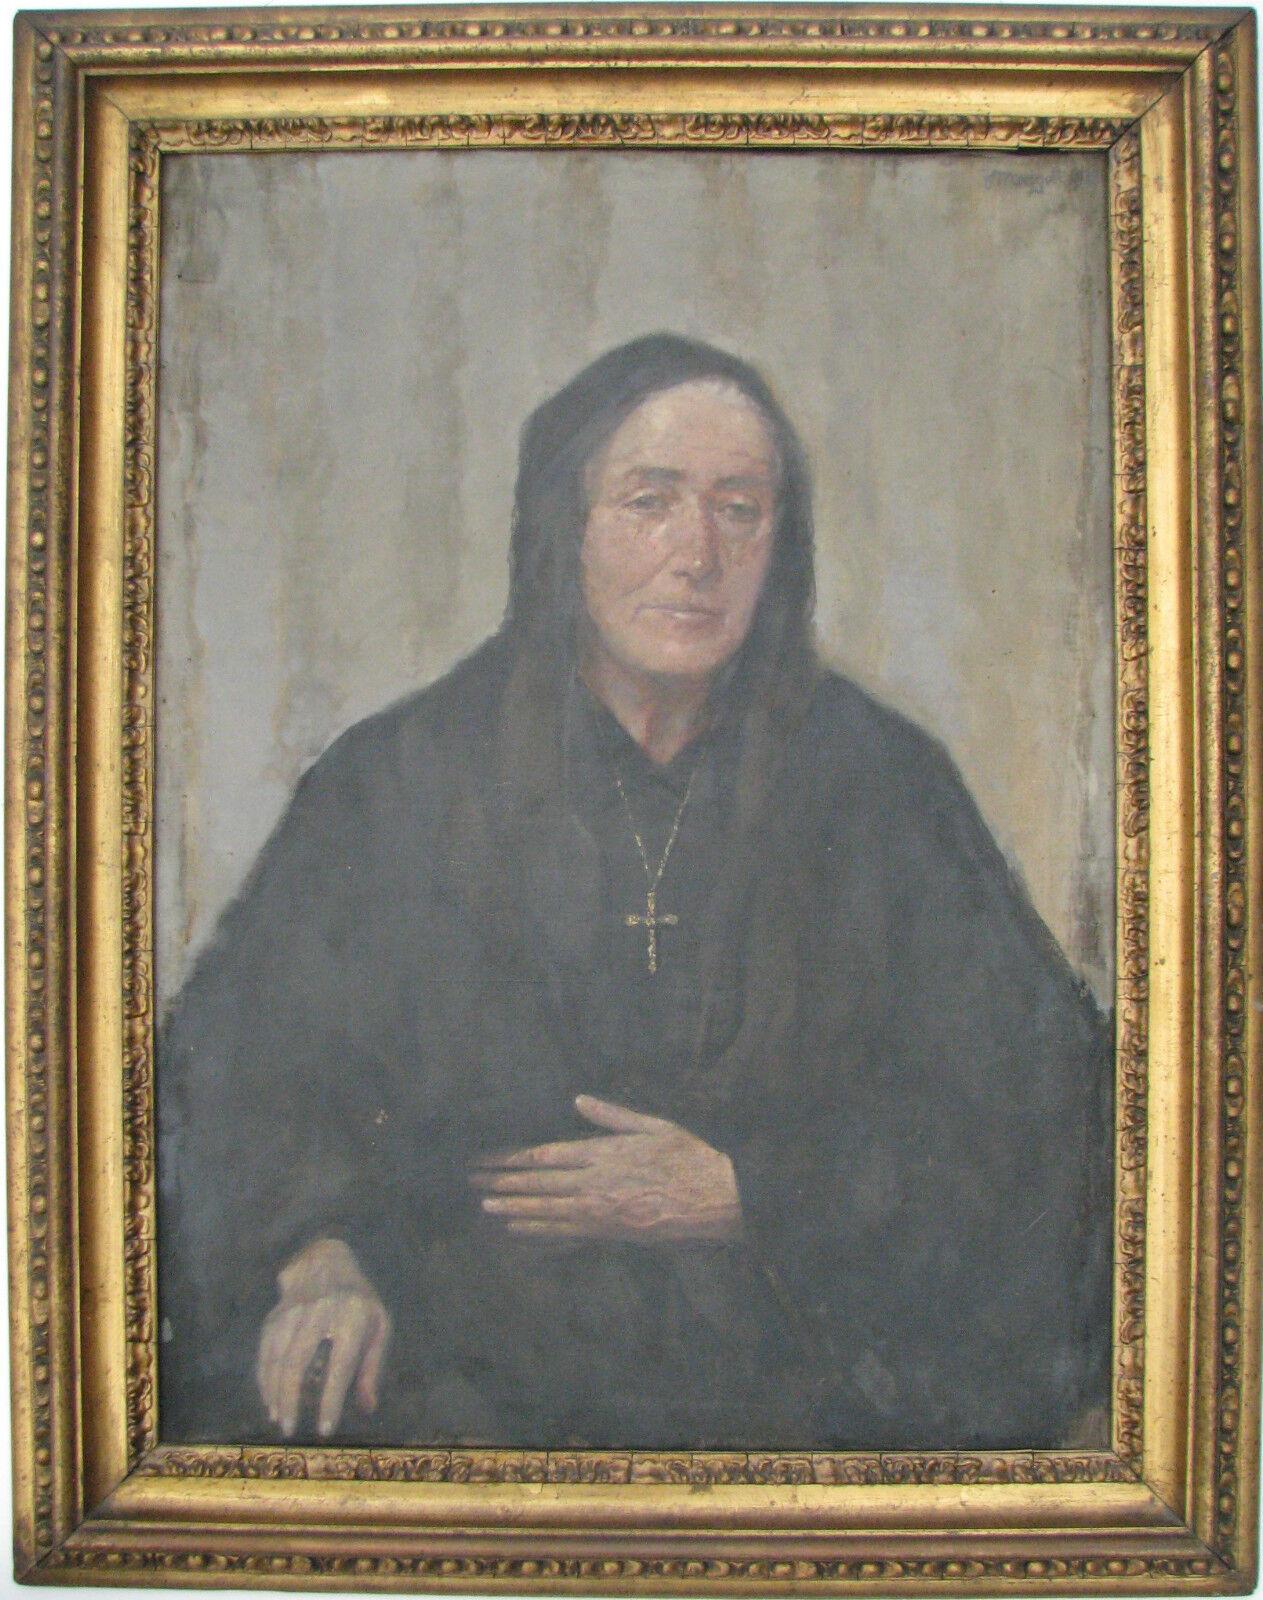 Francesco MARGOTTI (Torino 1868 - Tortona 1946) Santa vecchiaia cm 92x69 1928